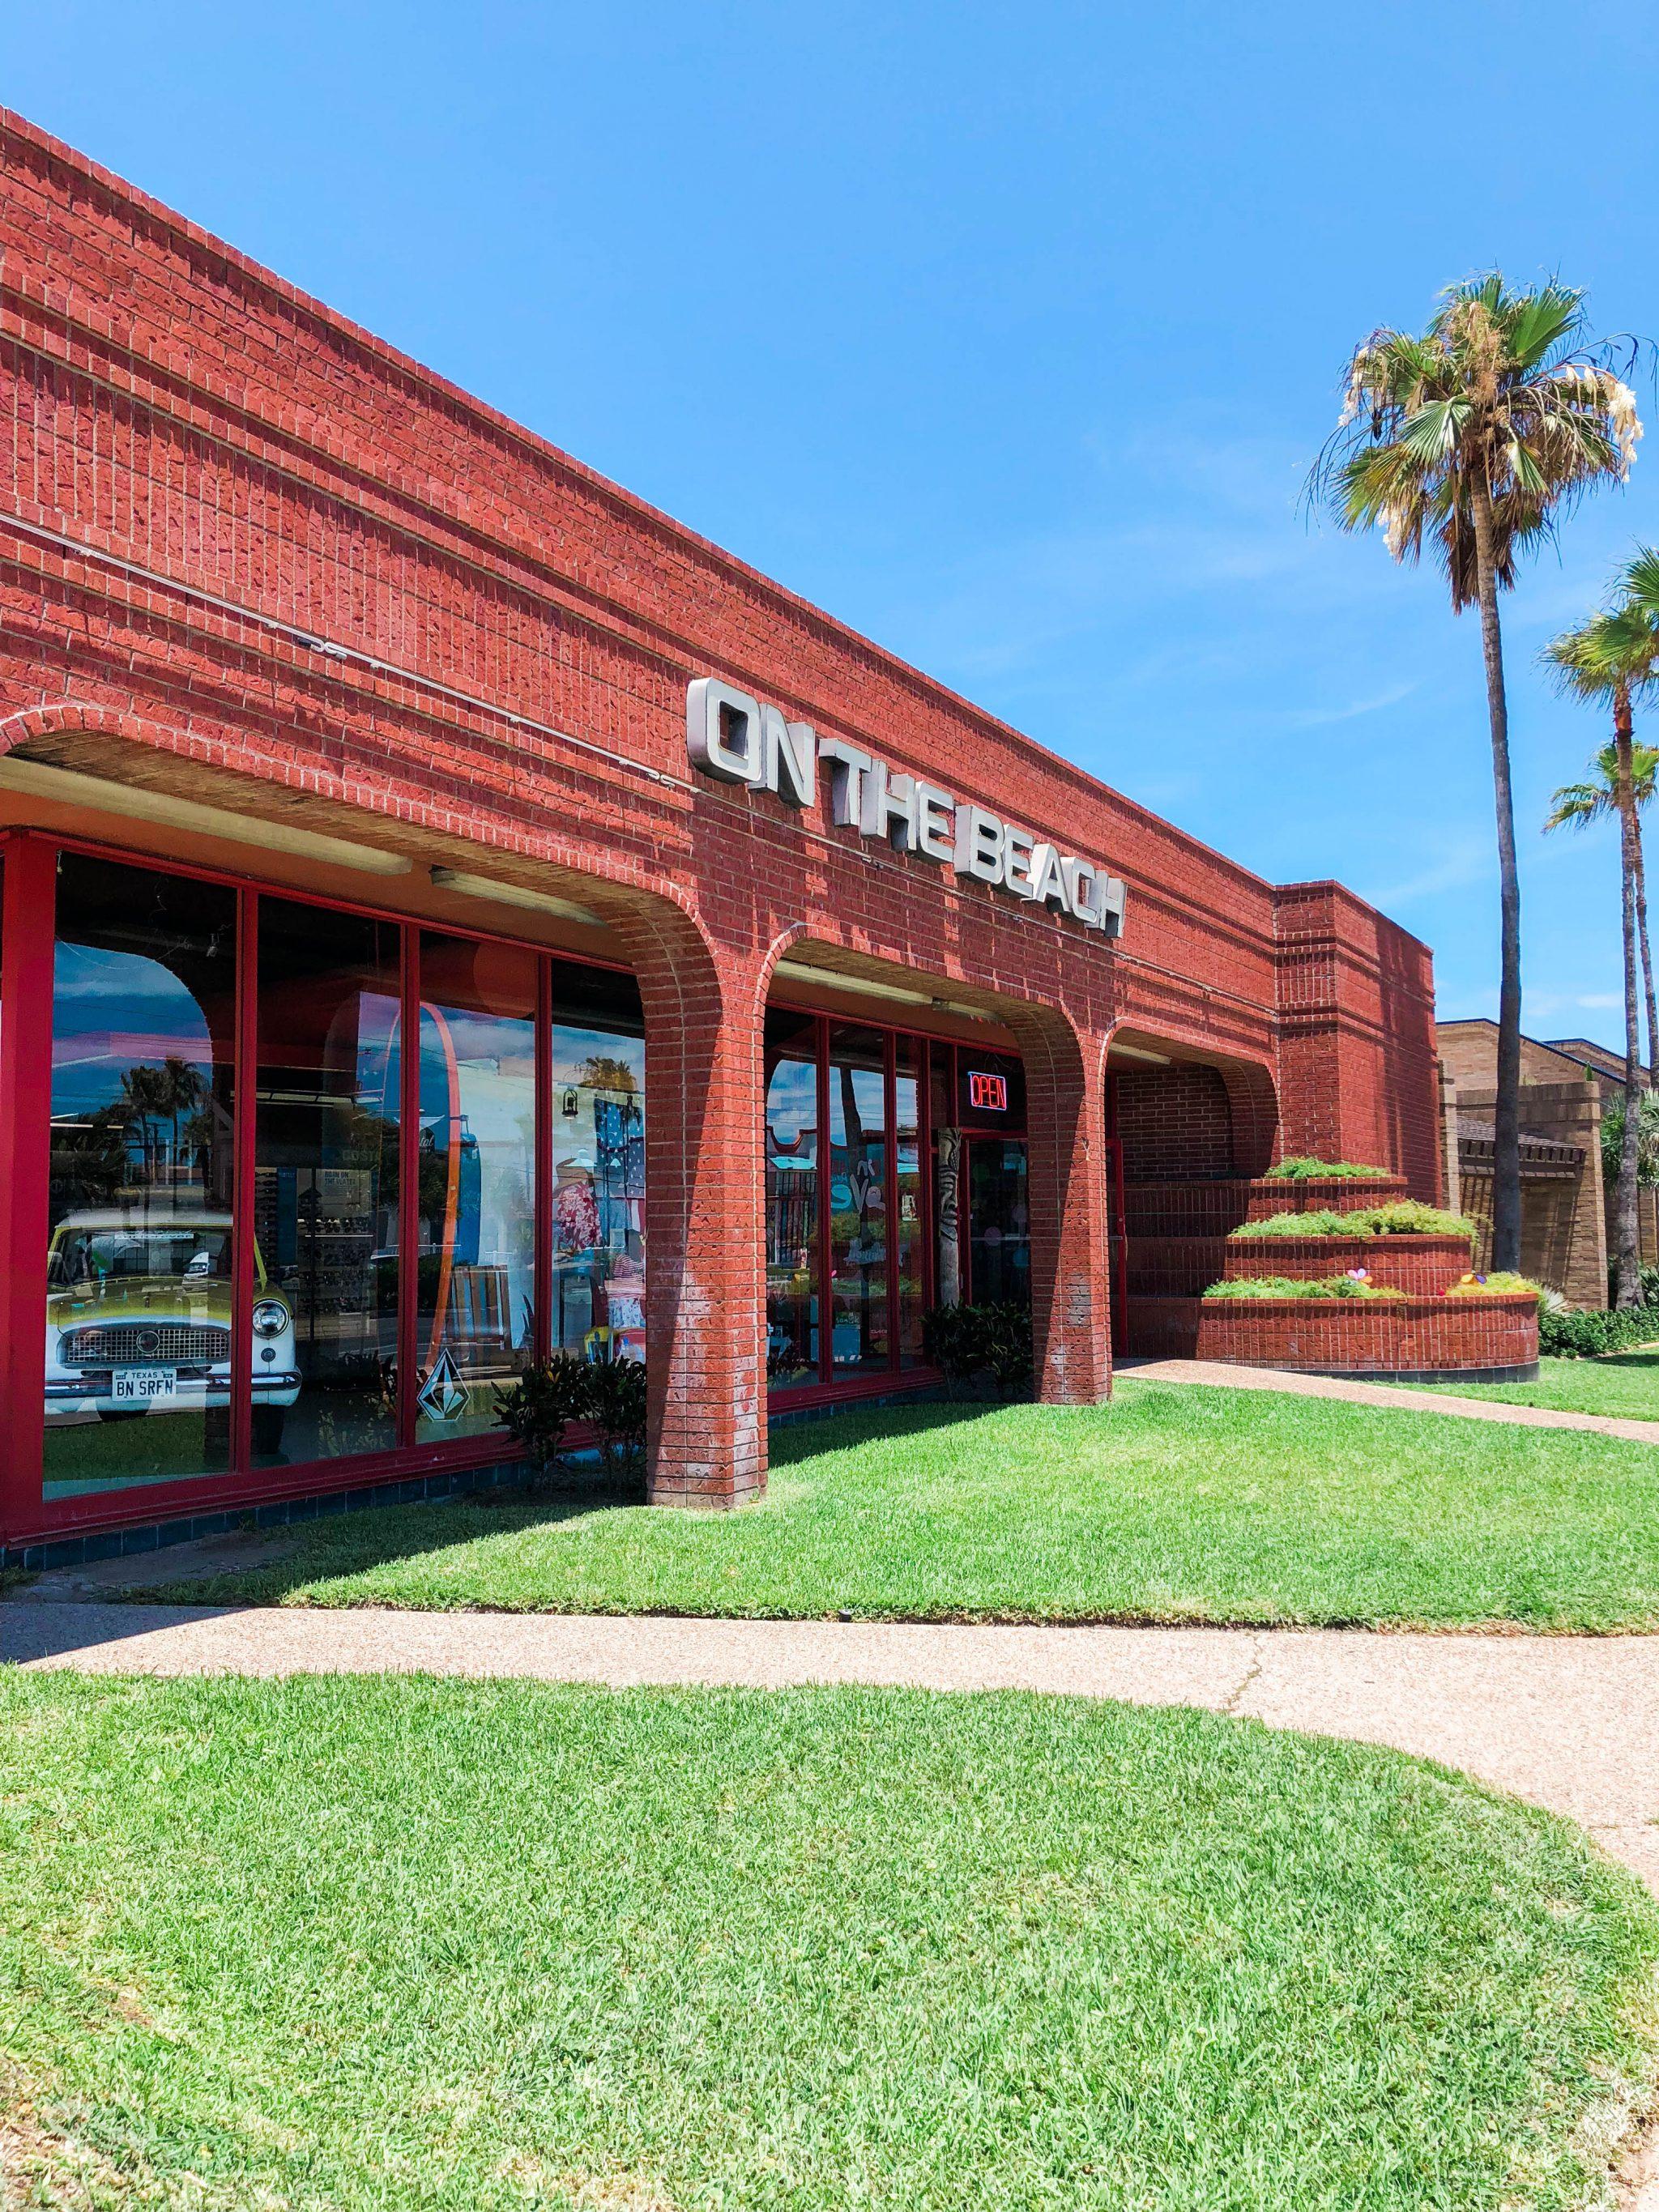 South Padre Island beach shops